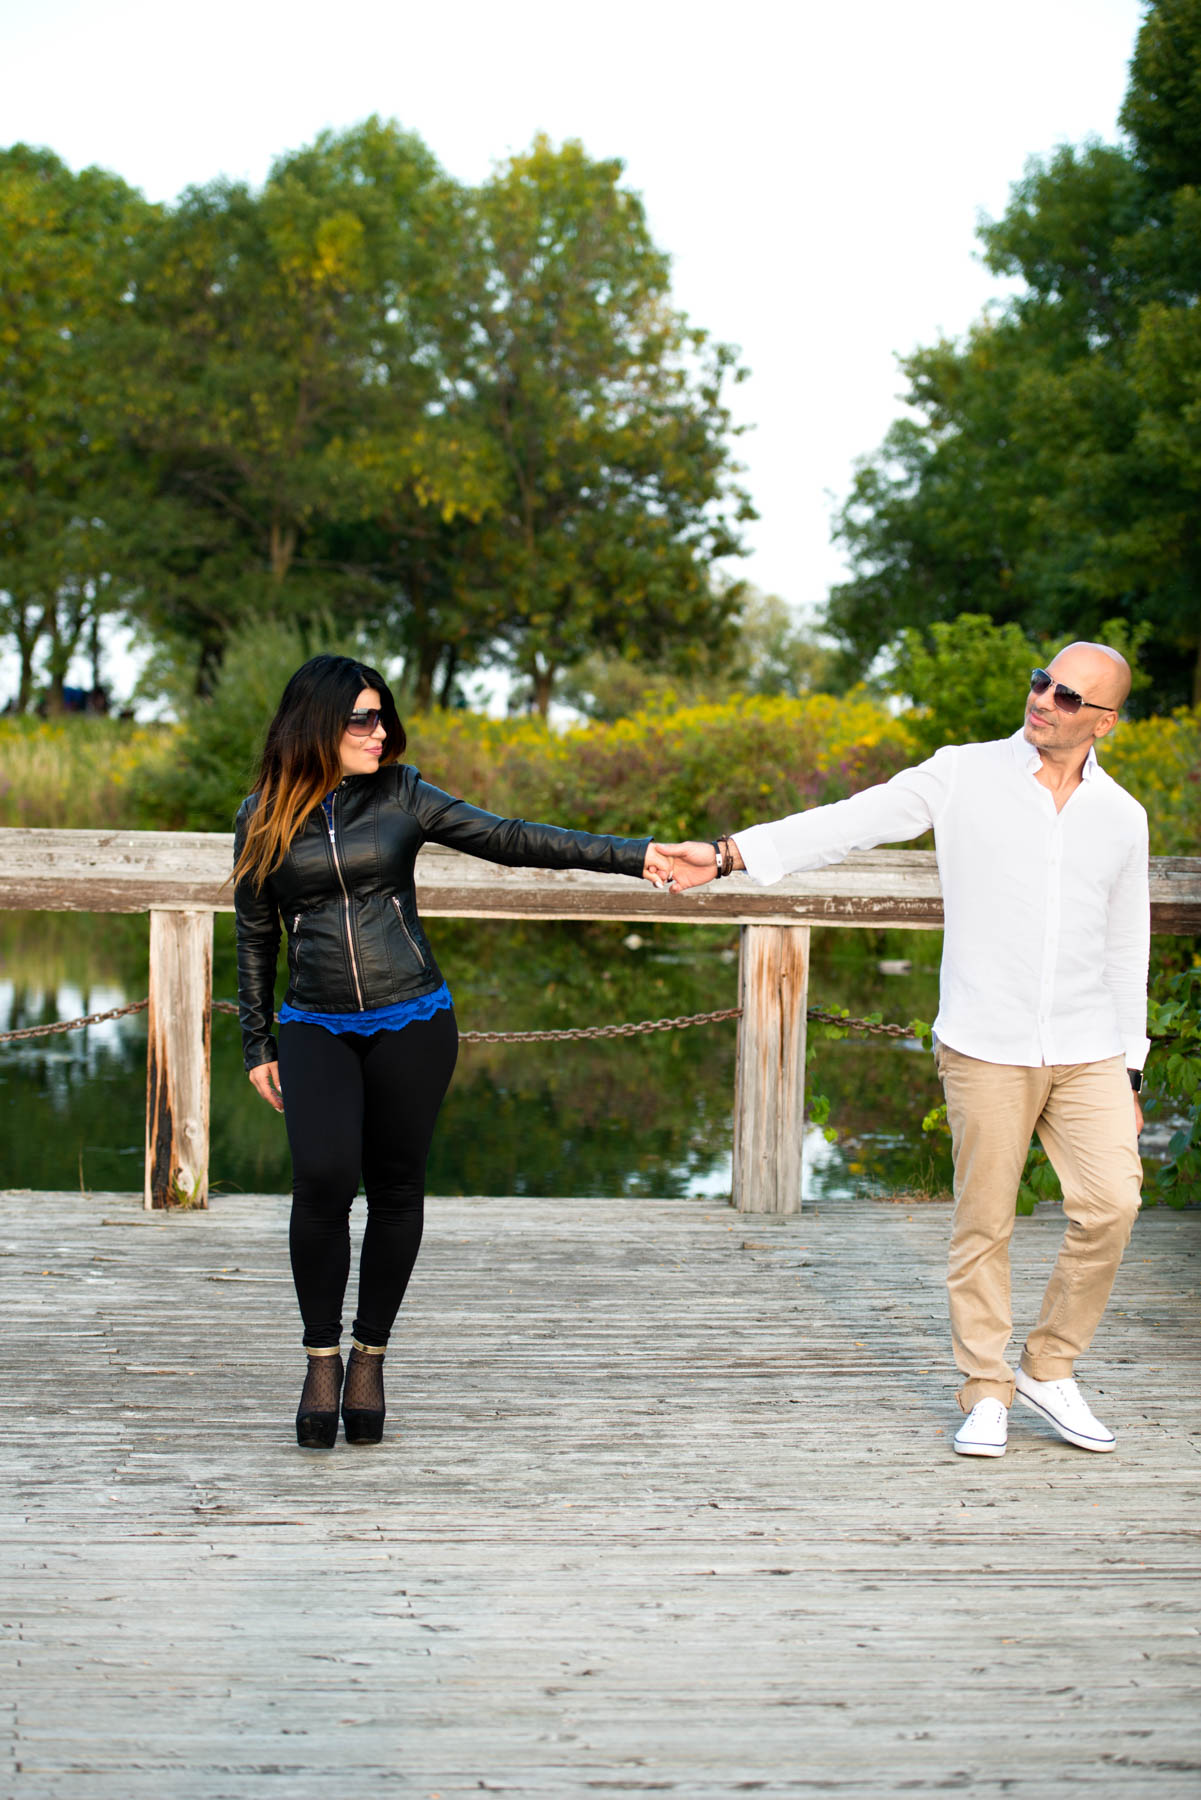 037 - Engagement FL Humber Bay Park - Toronto